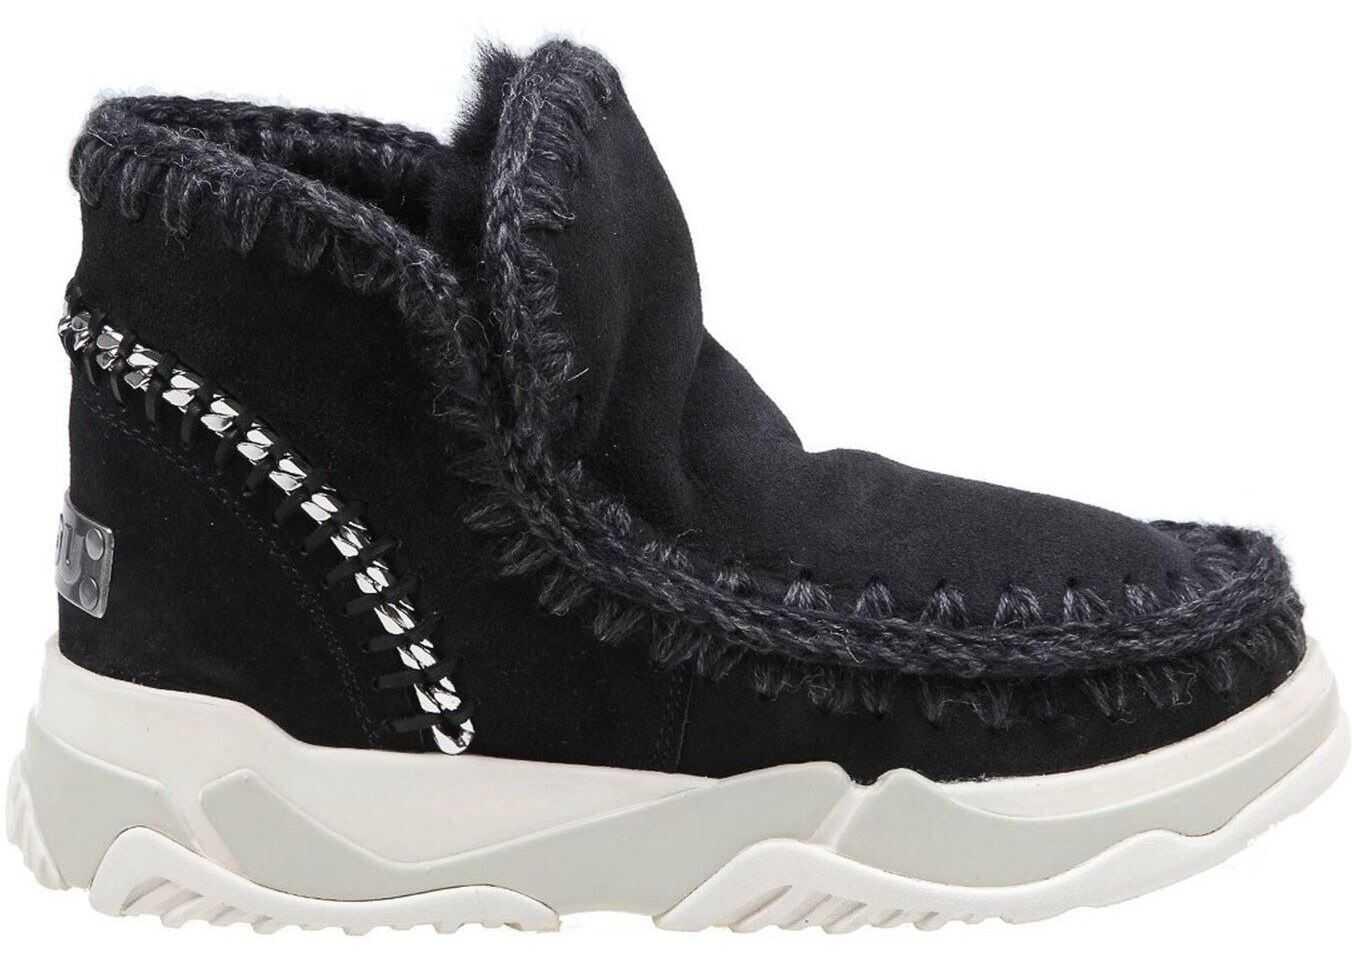 Mou Eskimo Chain Detailed Suede Sneakers In Black MU.FW201006A BKBK Black imagine b-mall.ro